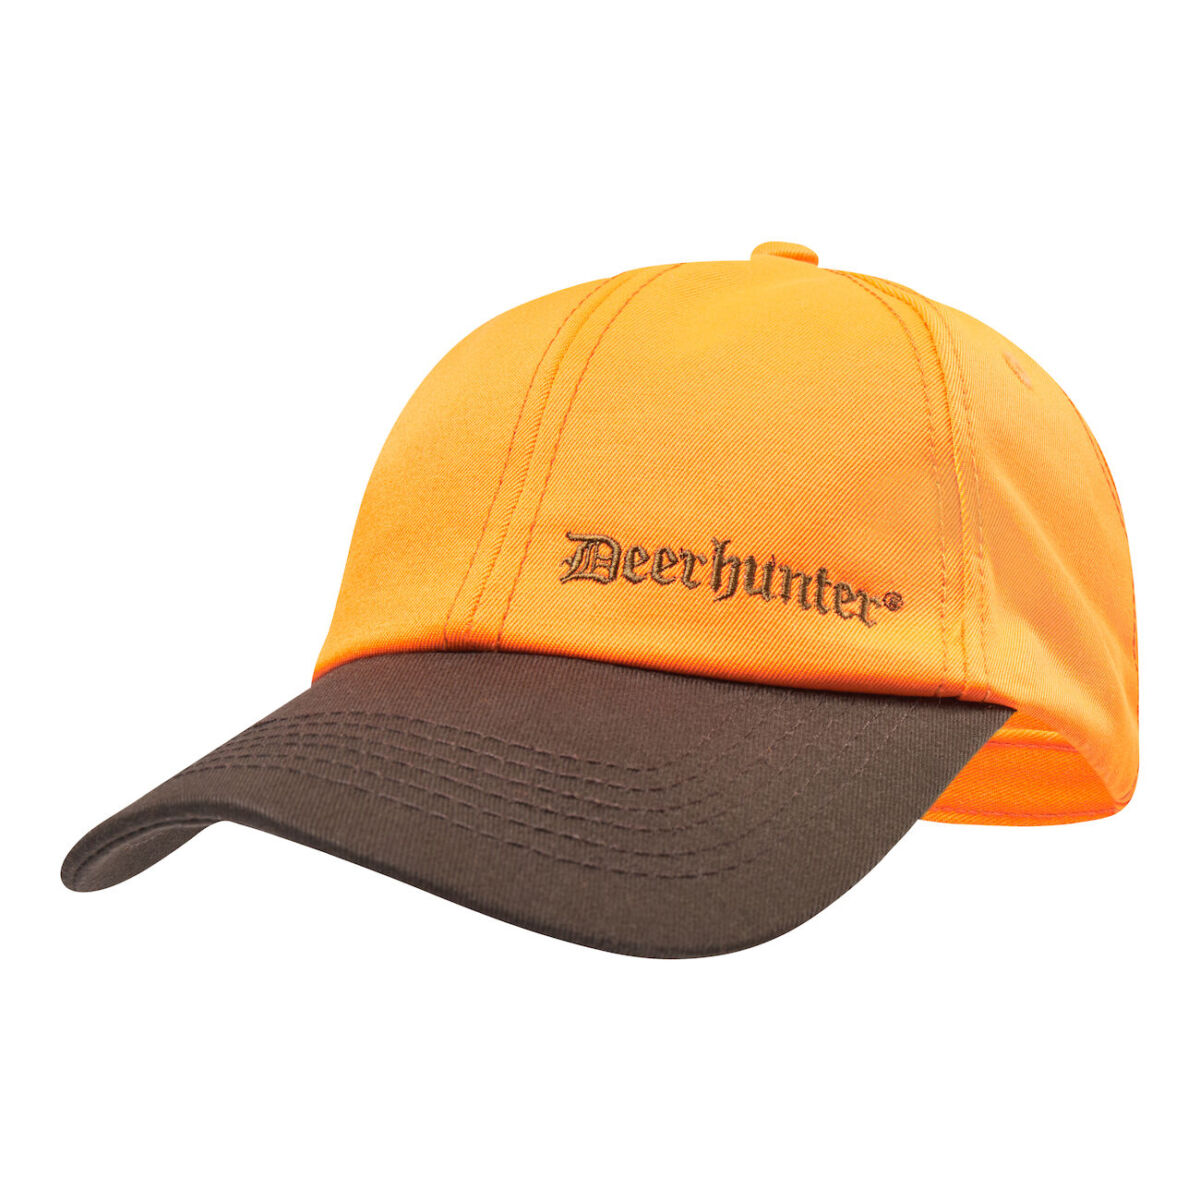 Keпка Deerhunter Bavaria Cap Orange One size